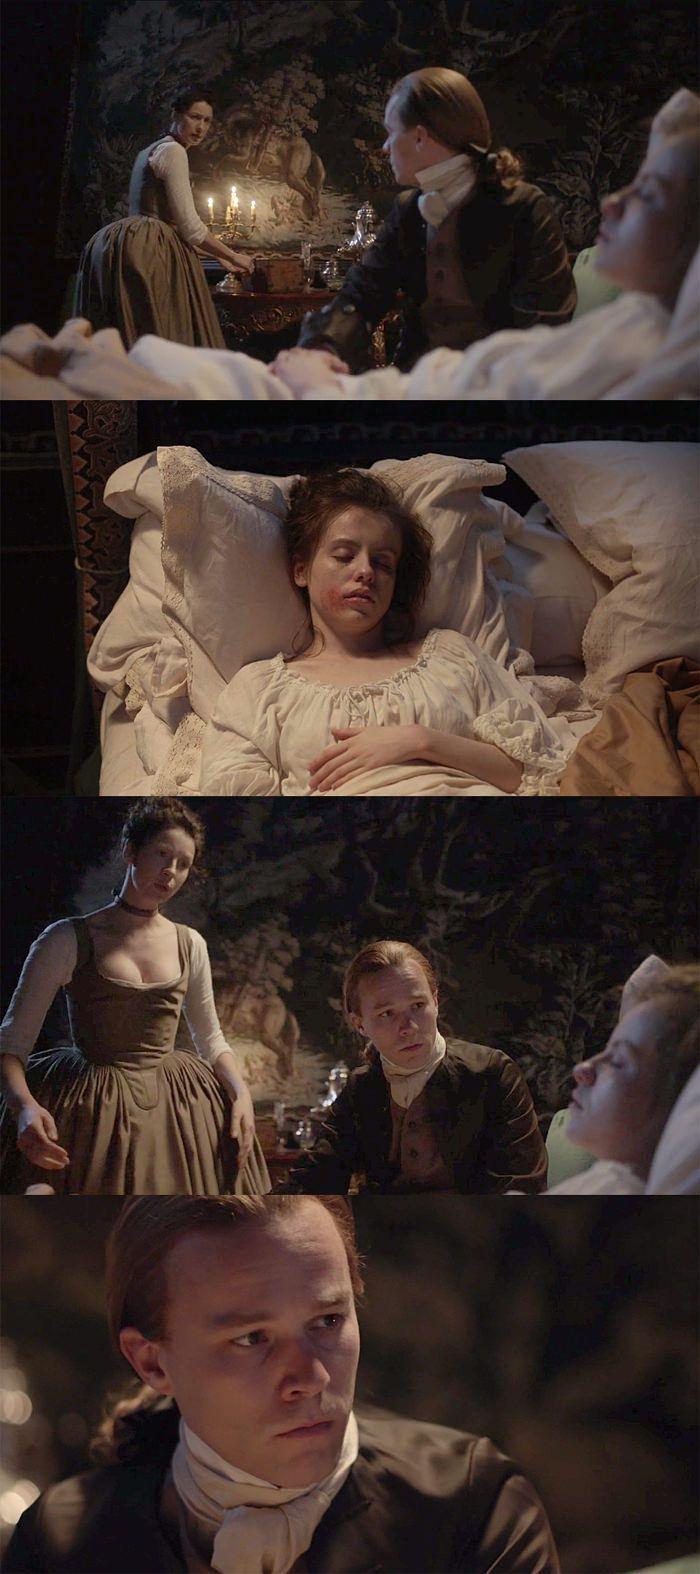 Outlander-Style-Season-2-Episode-4-TV-Series-Starz-Costumes-Tom-Lorenzo-Site (17)